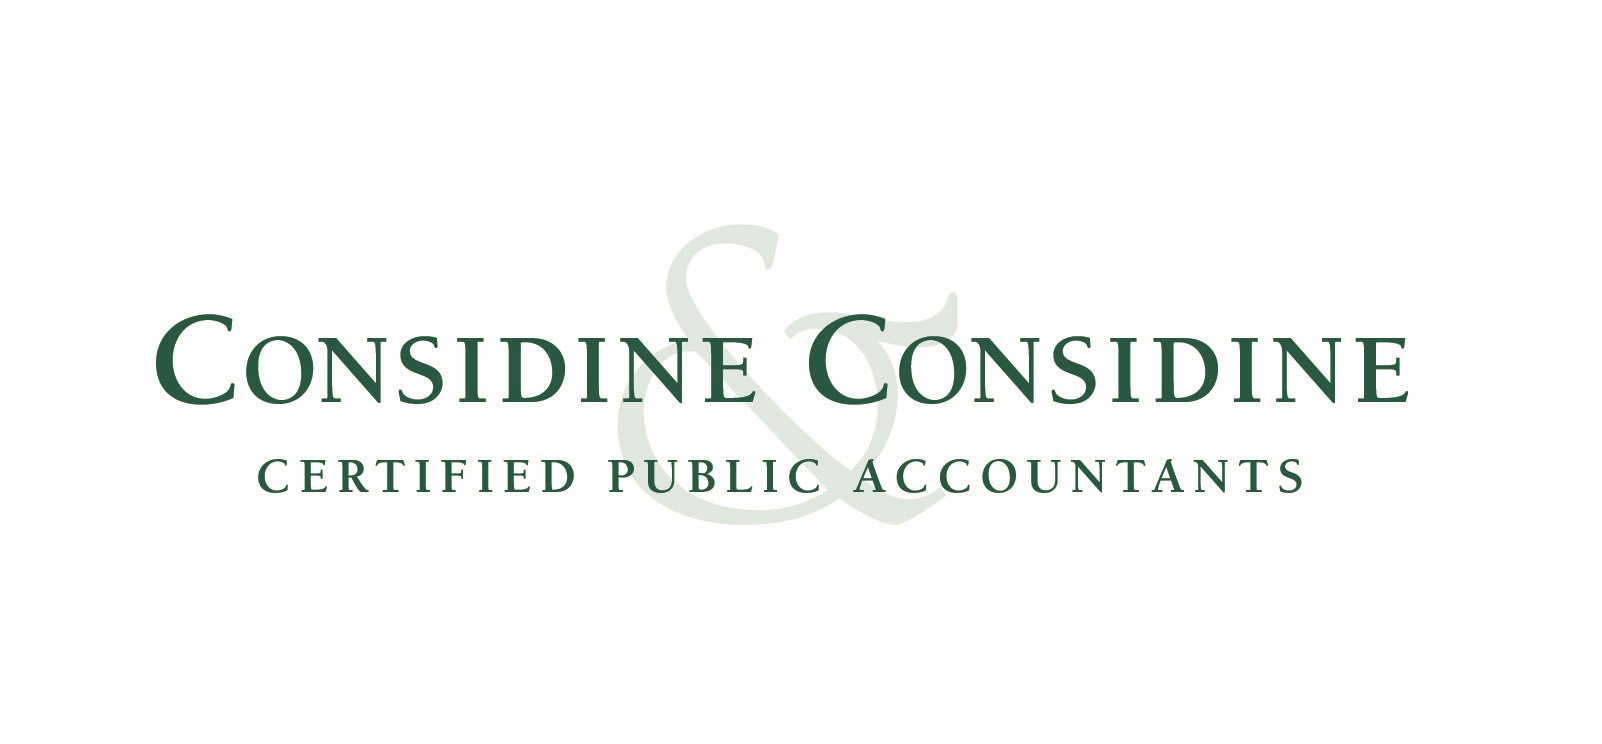 Considine & Considine CPA